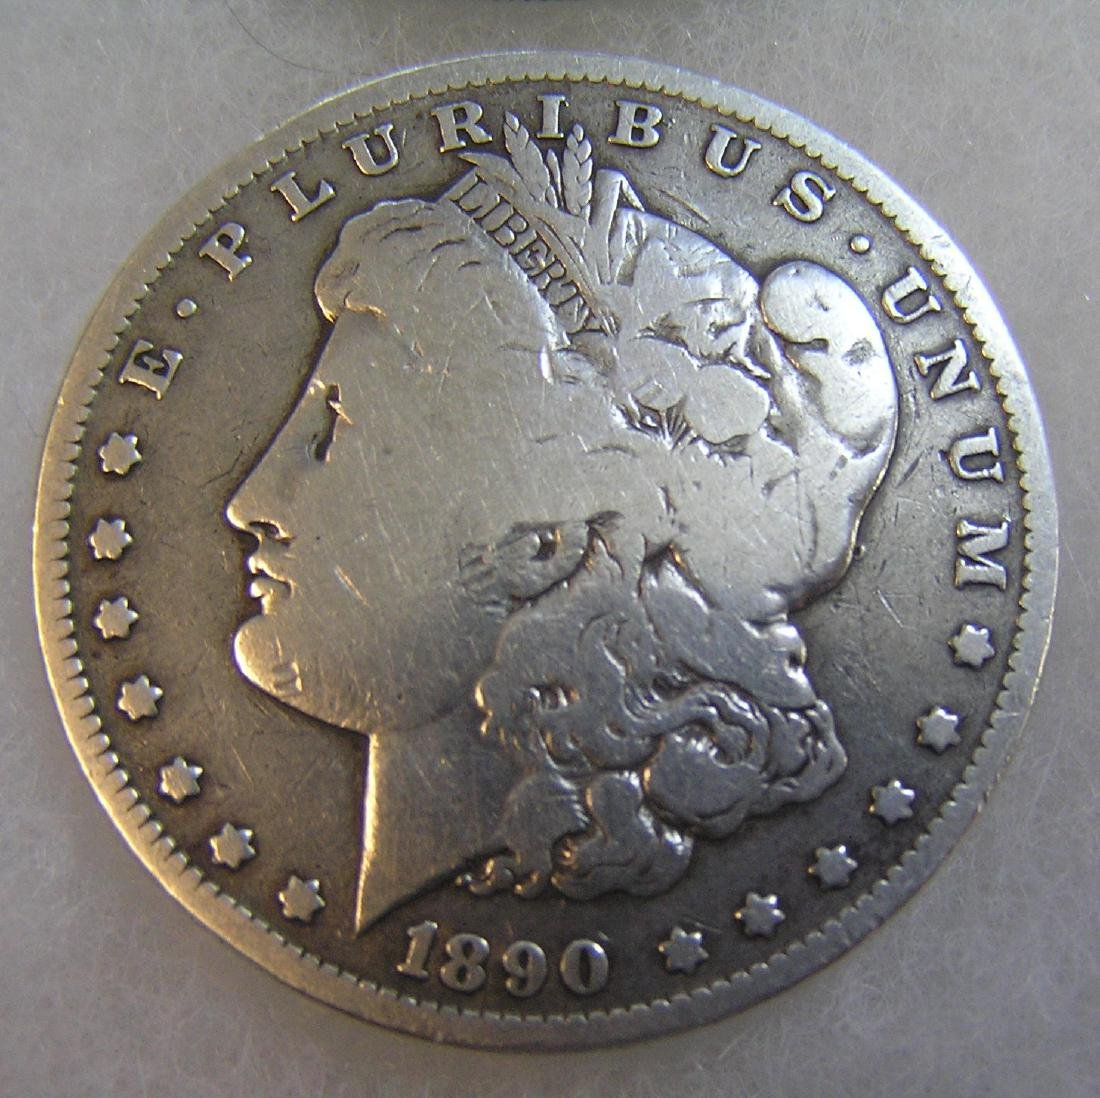 1890-O Morgan silver dollar in very good condition